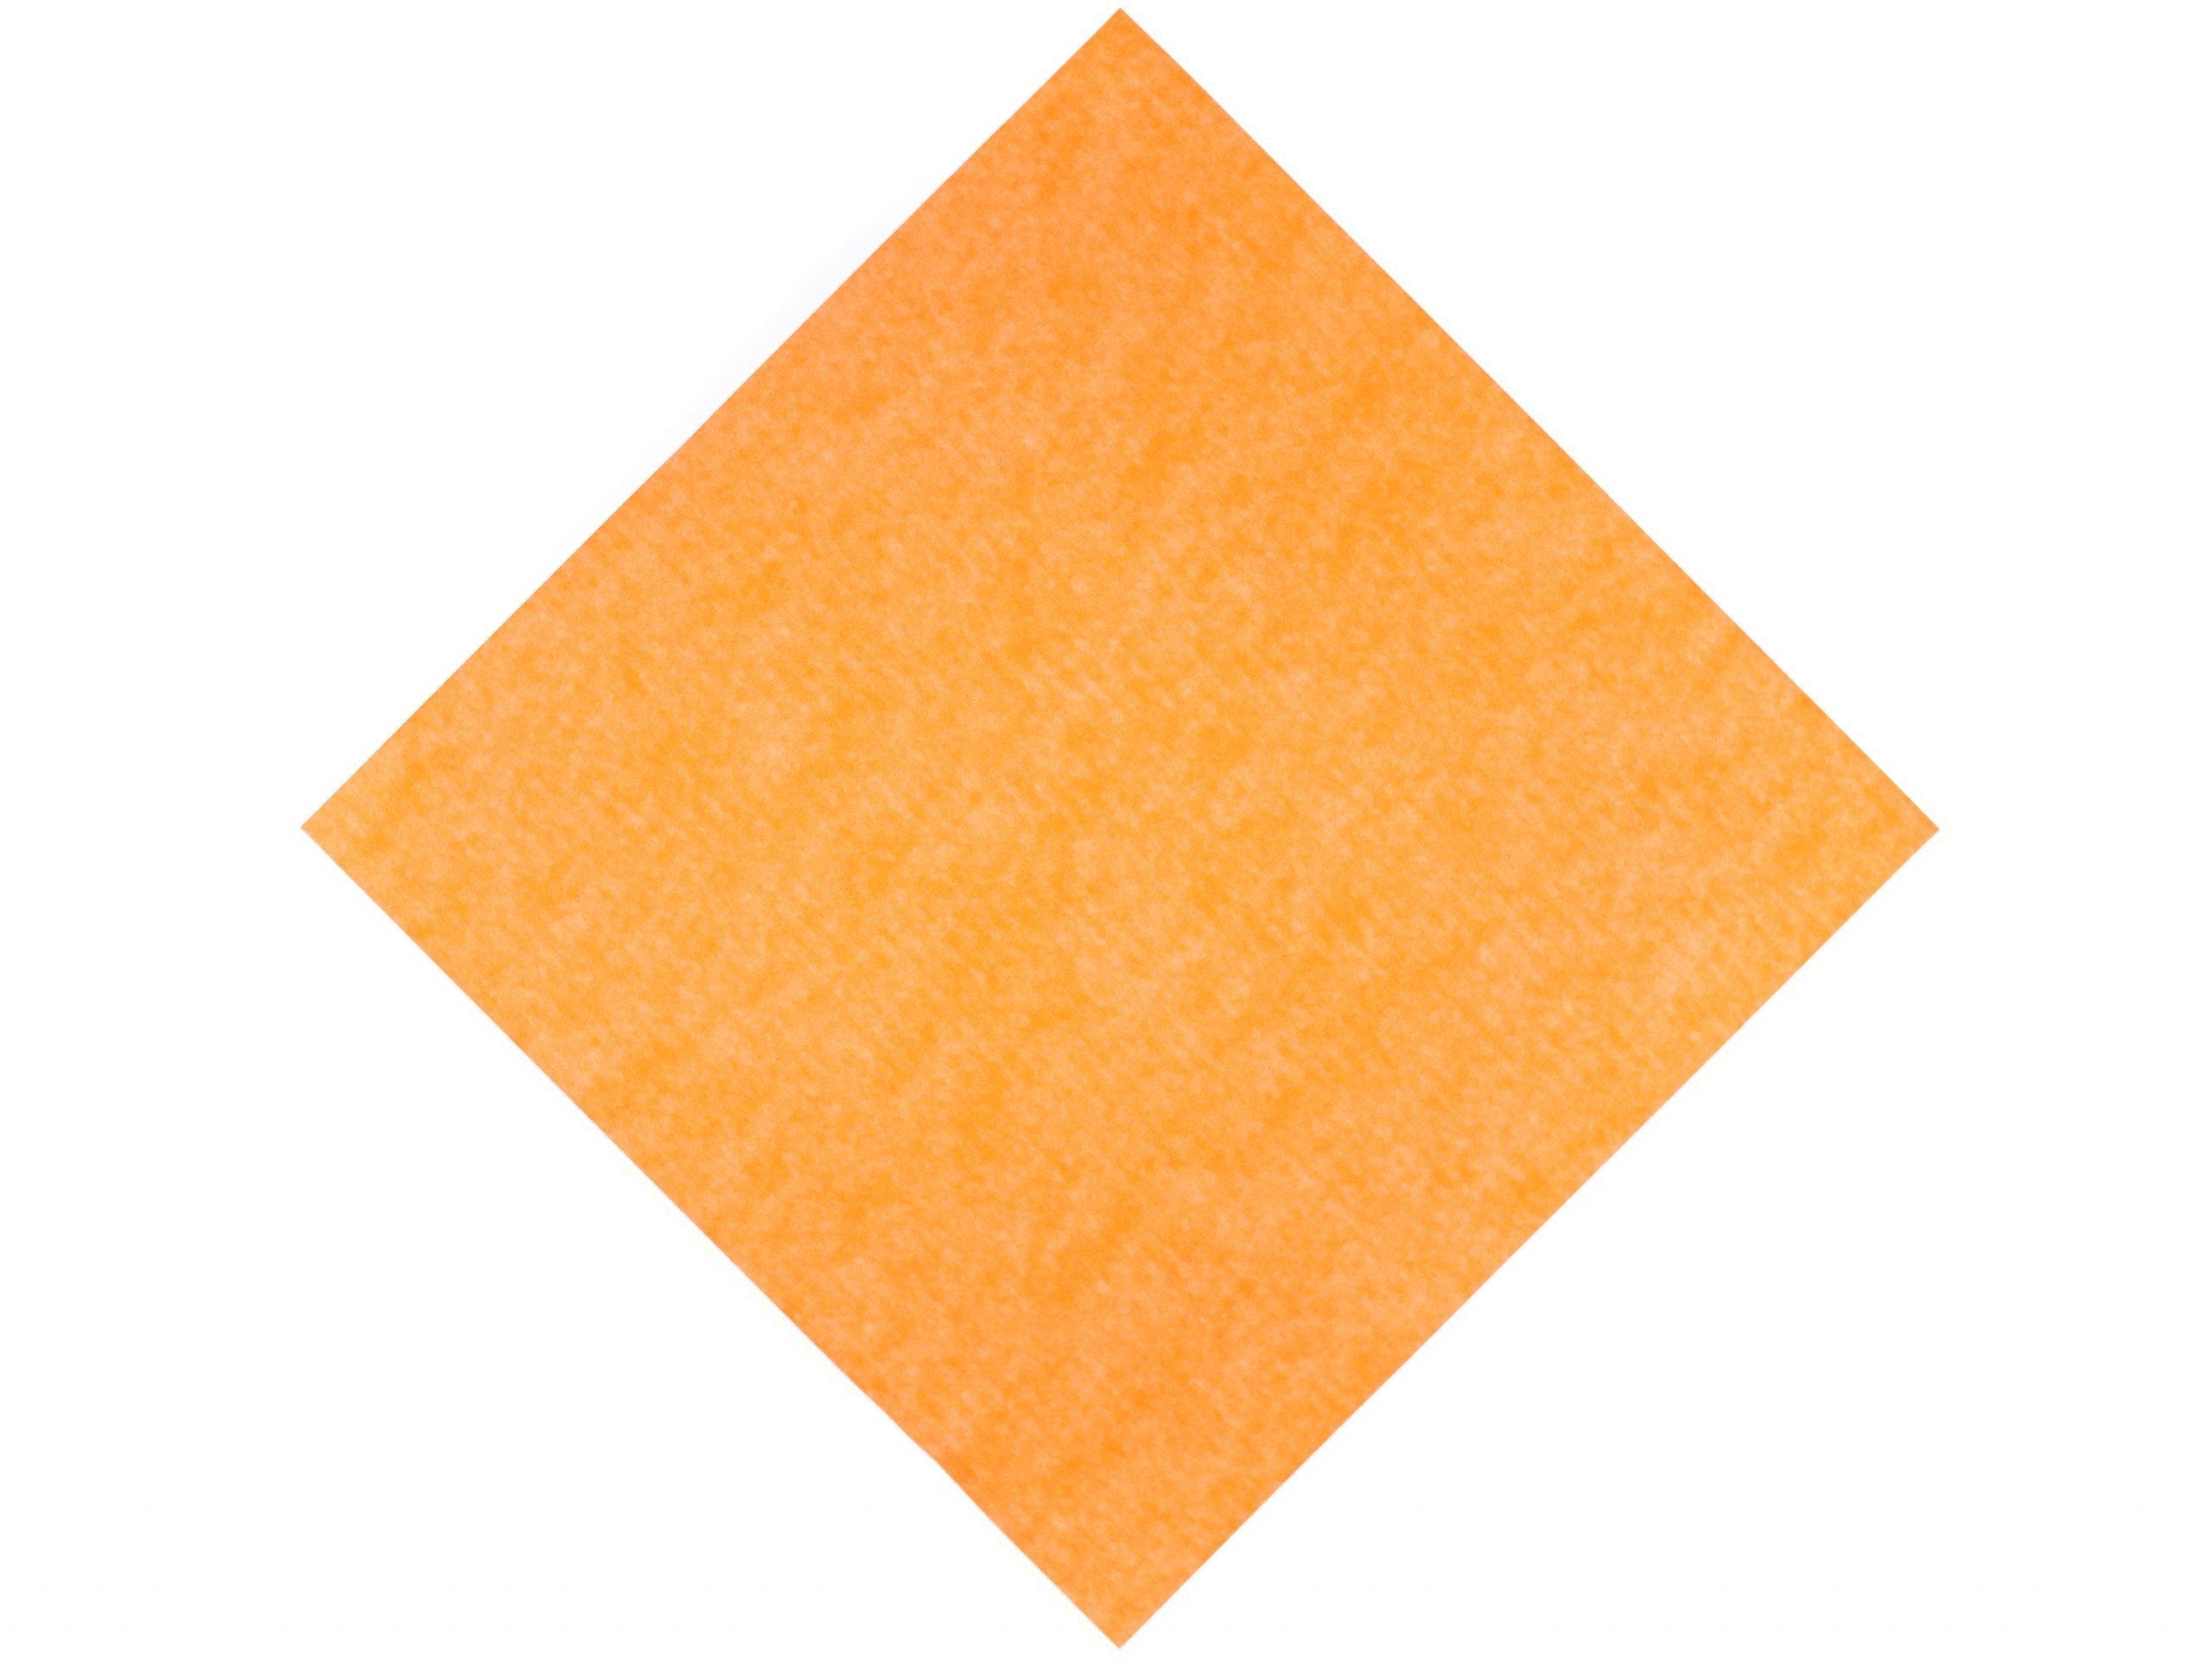 square of orange kite paper